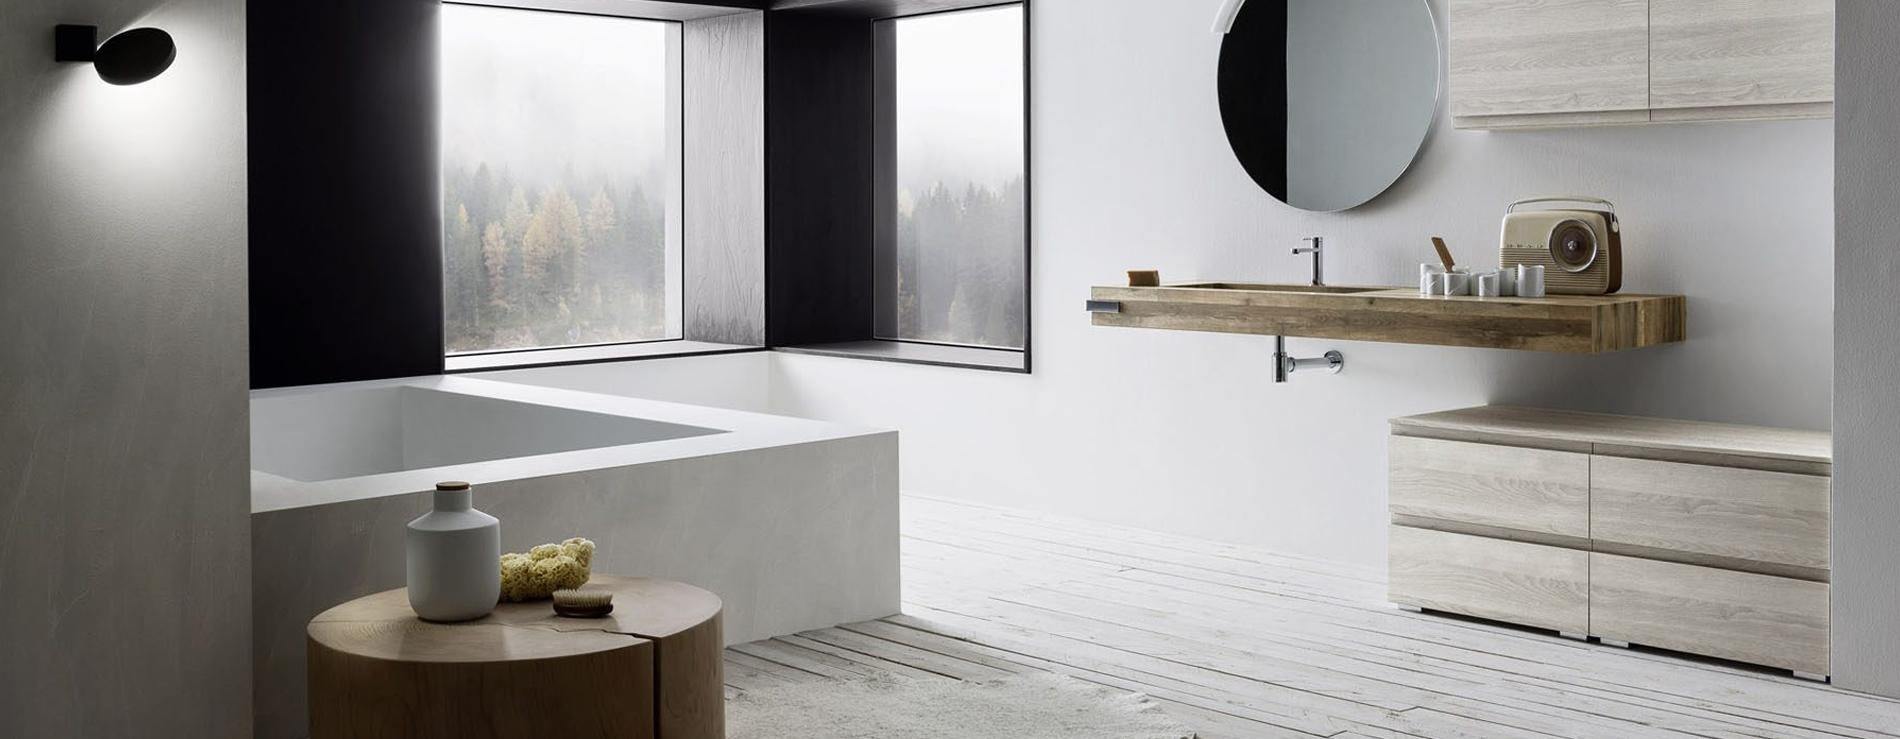 Bagno linfa di arbi centro mobili godiasco salice terme for Arbi arredo bagno catalogo